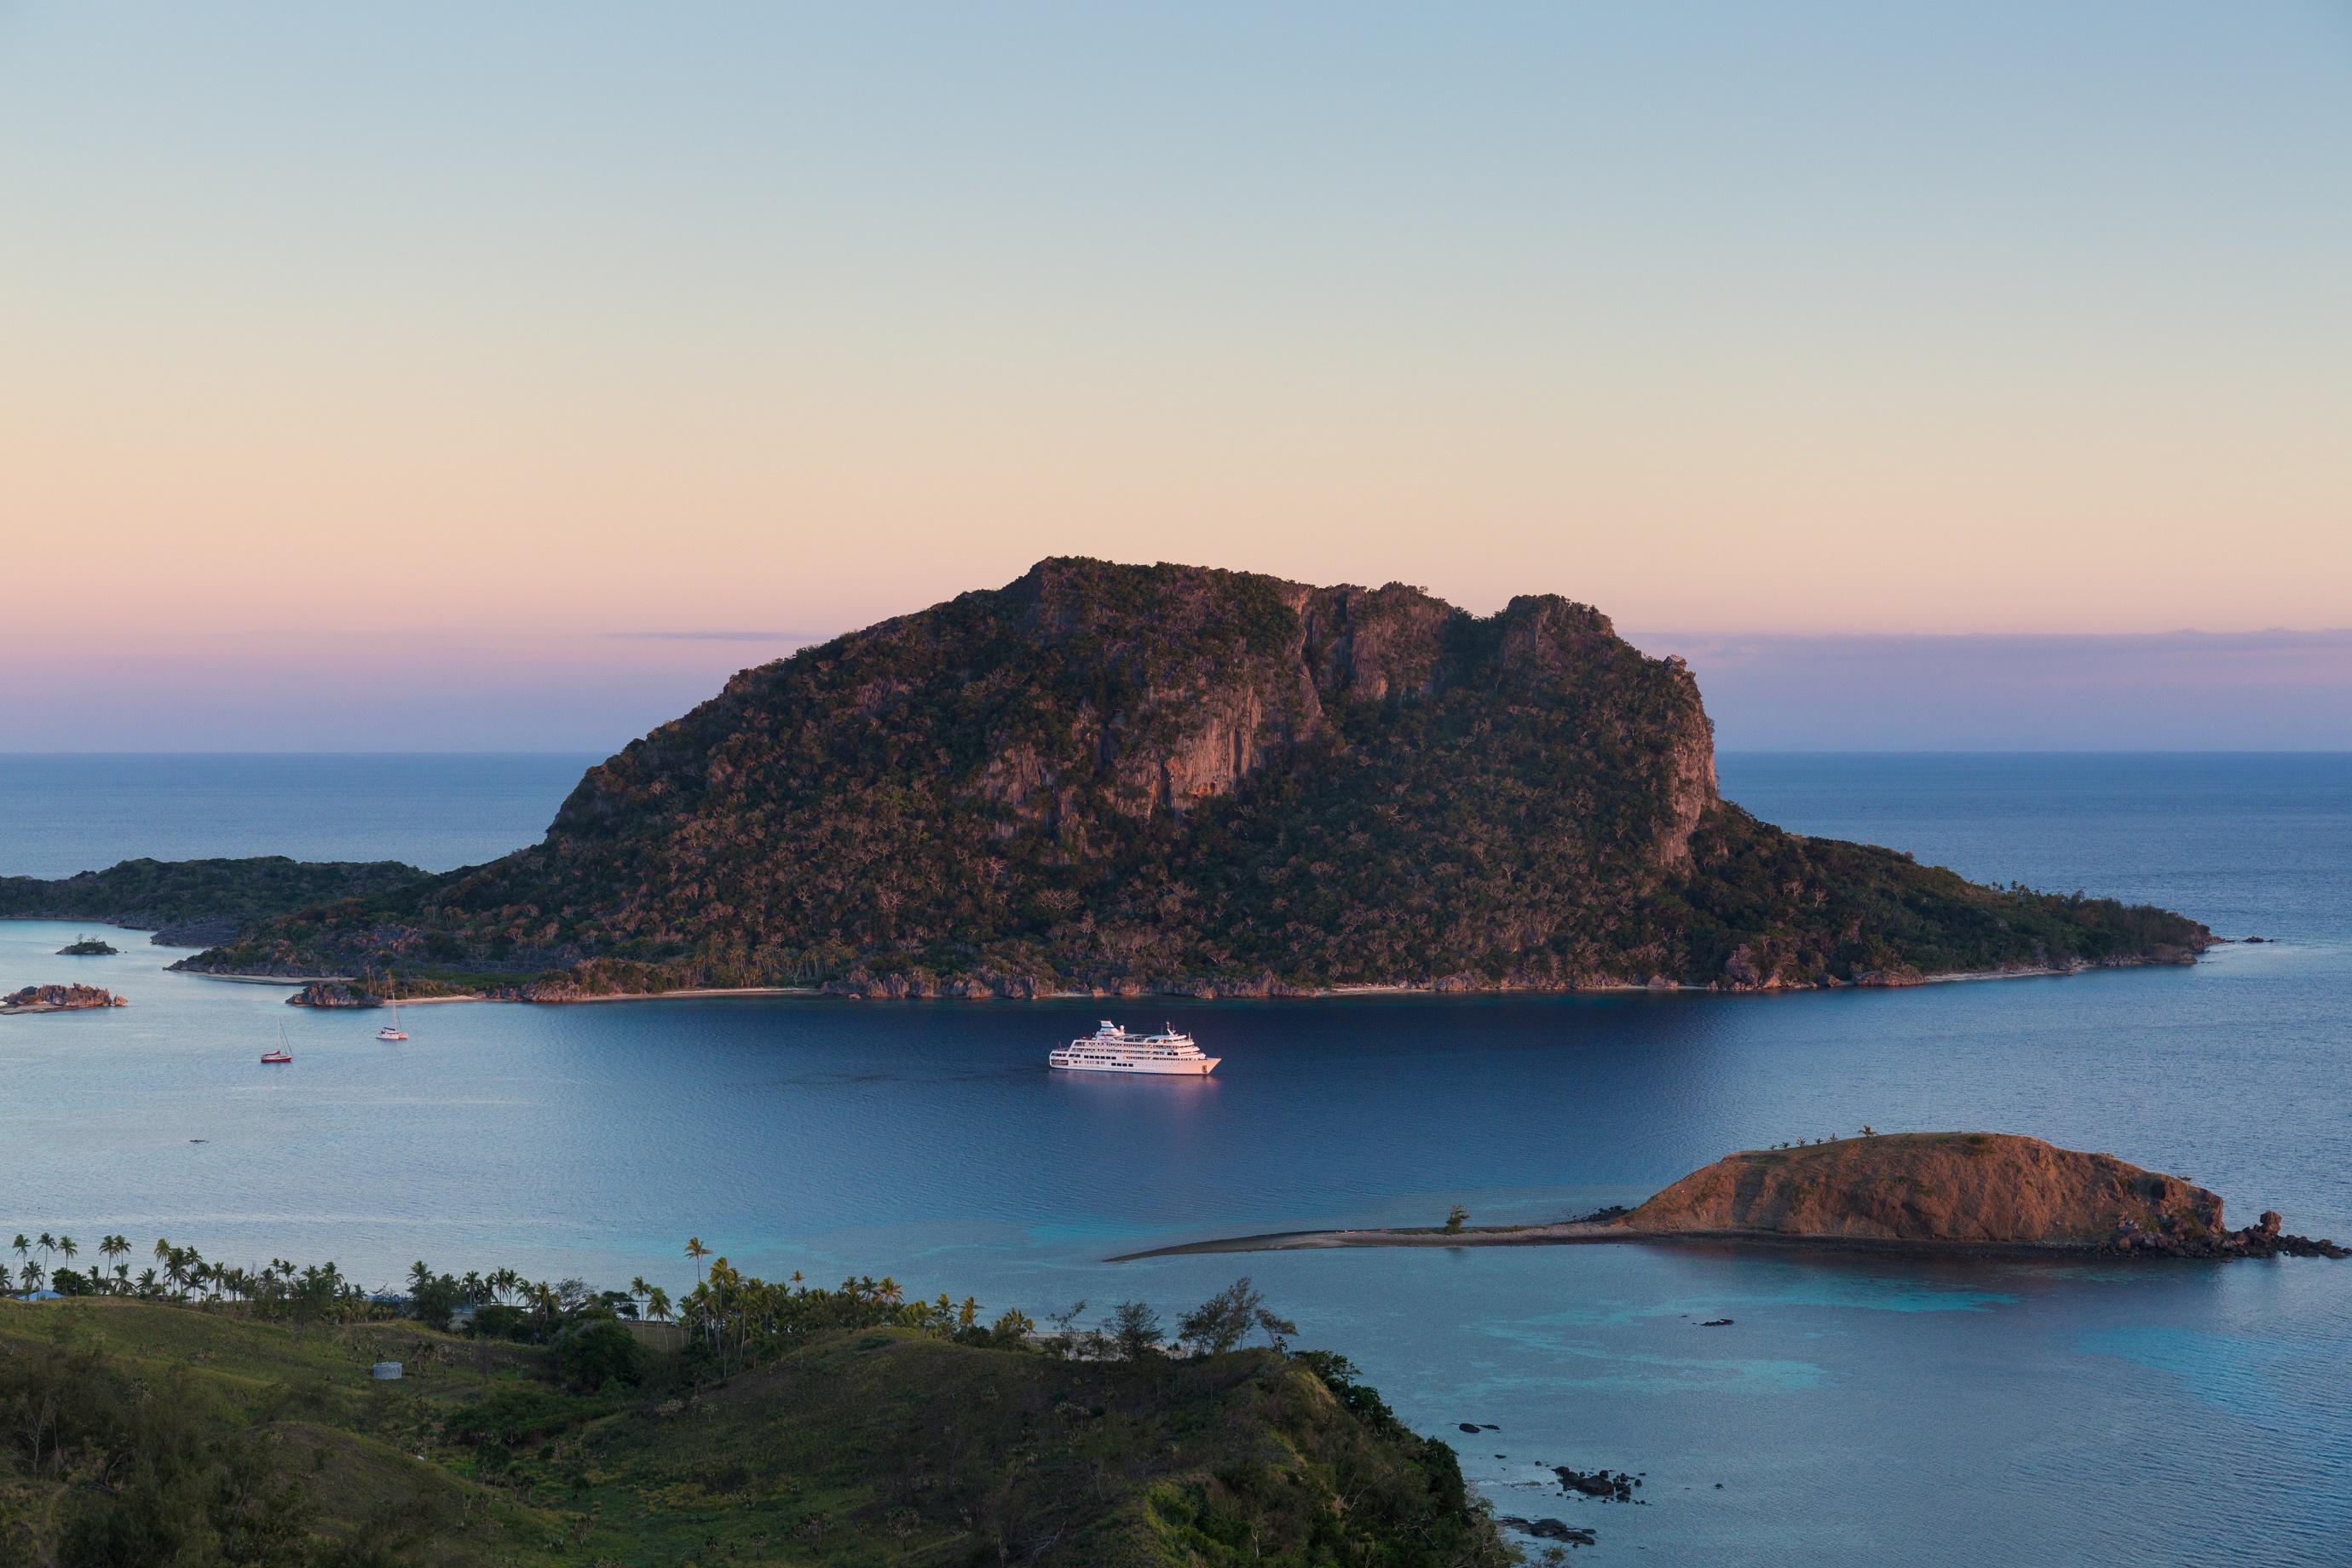 MV Reef Endeavour in Remote Fiji